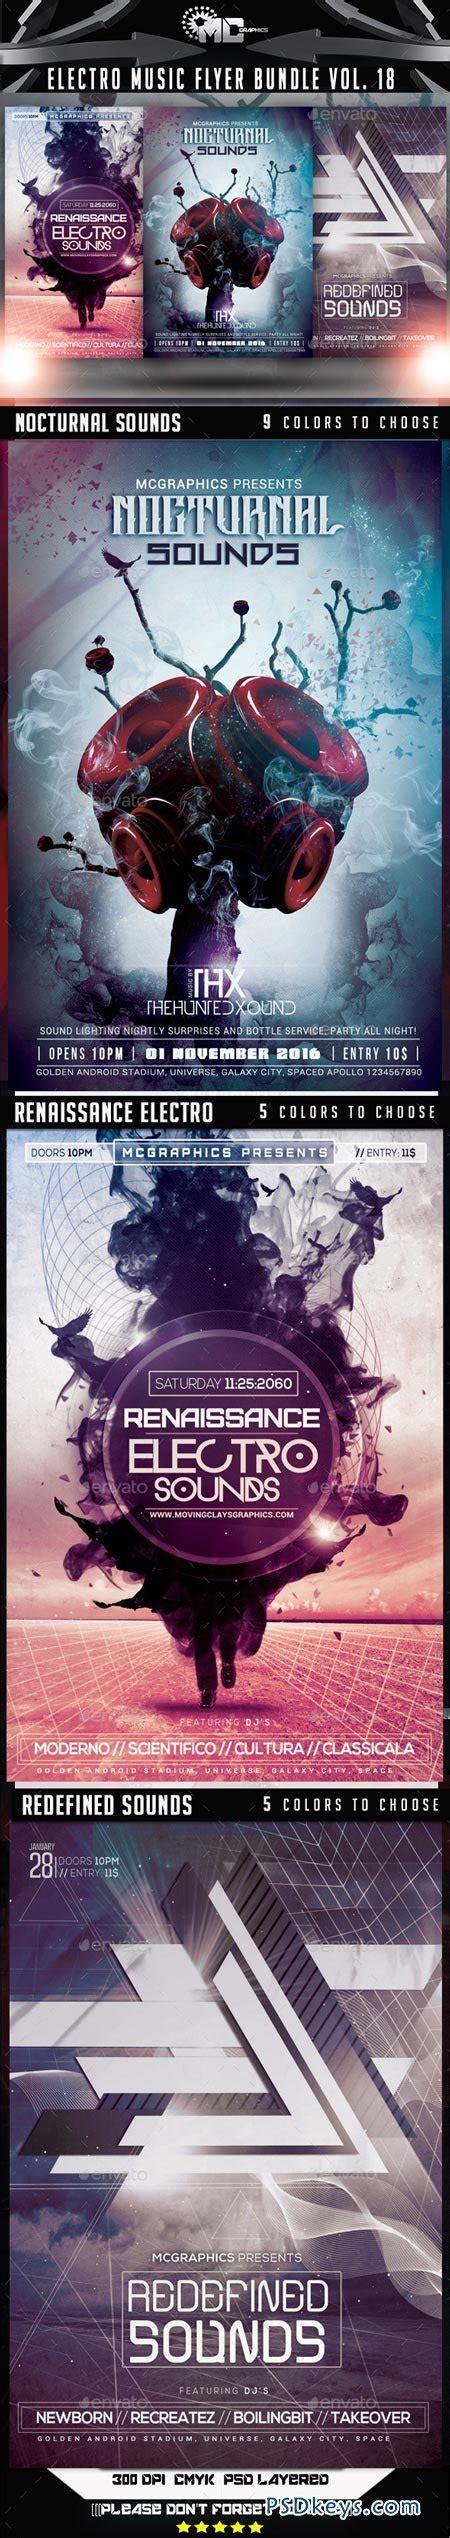 electro flyer poster template vol 4 torrent electro music flyer bundle vol 18 9072558 187 free download